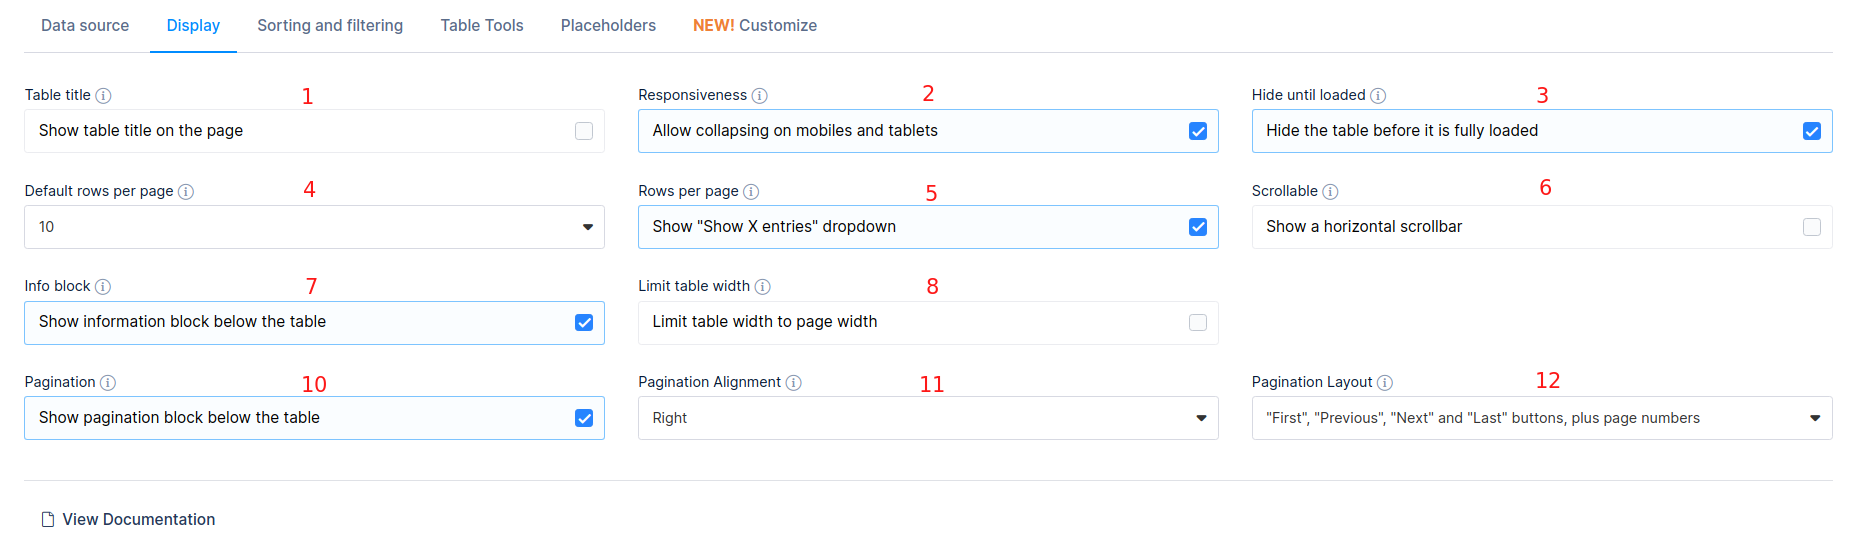 Table display settings